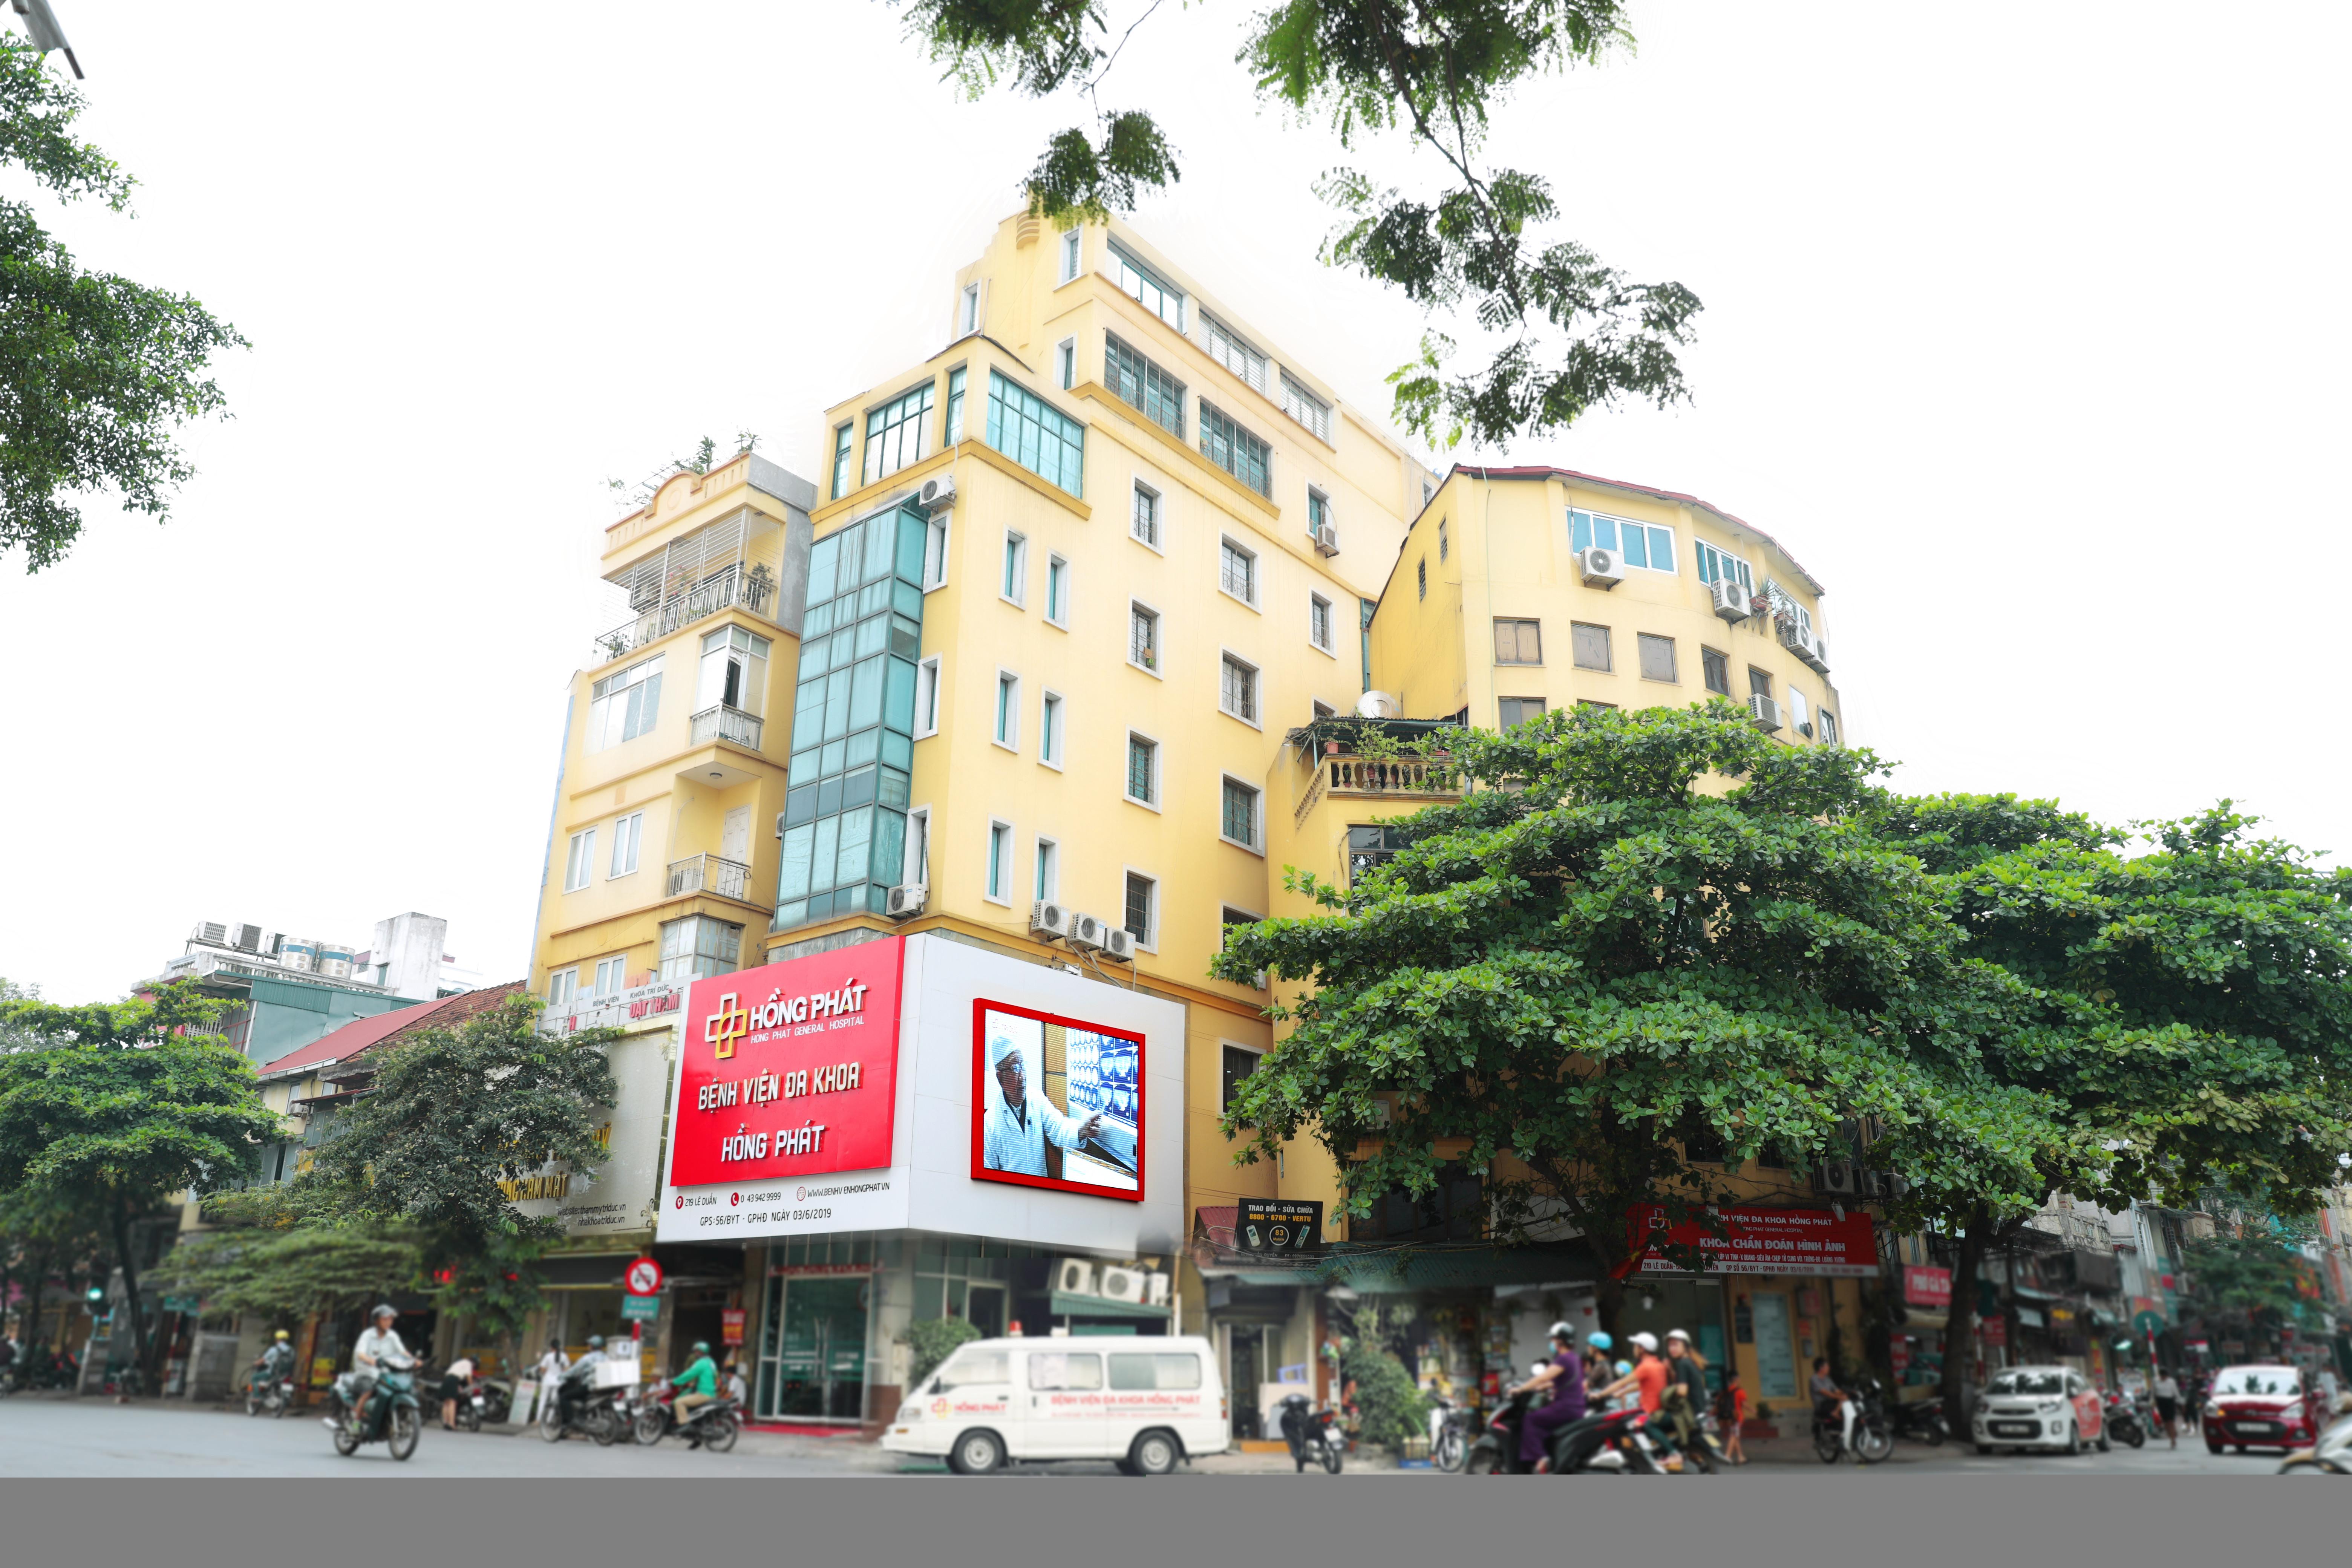 Image of Bệnh viện Hồng Phát